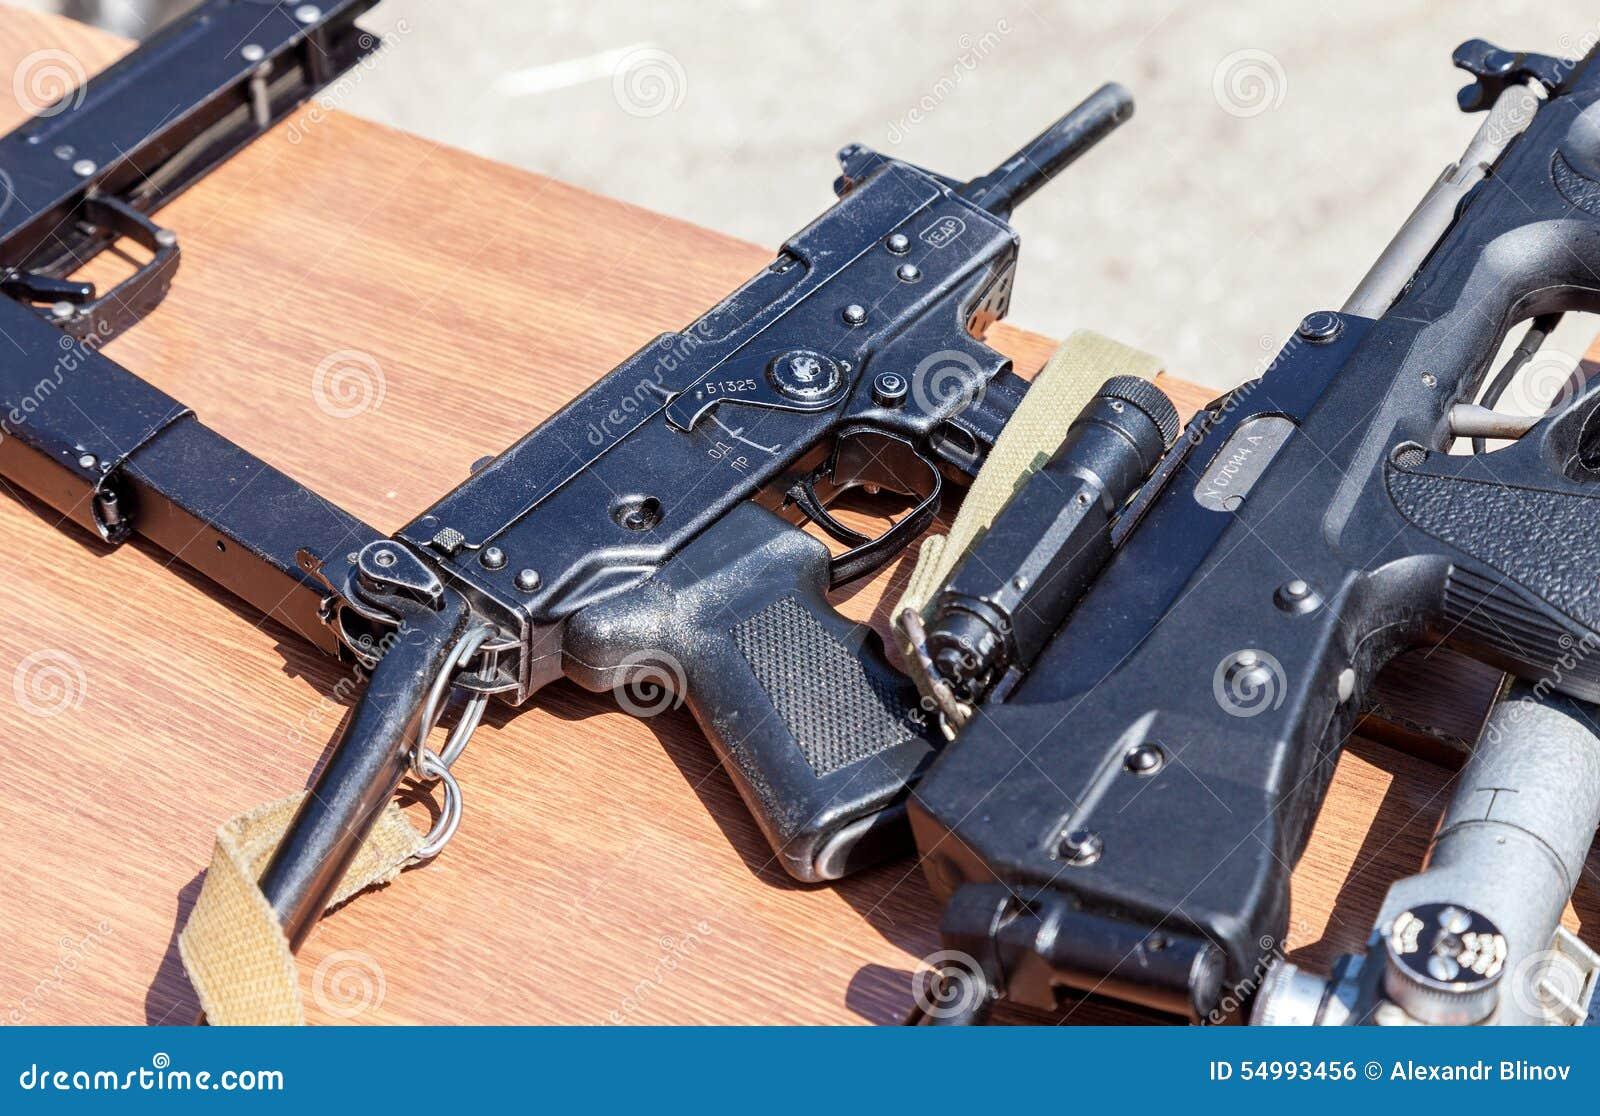 Alexandr pistoletov from russia to ukraine 3